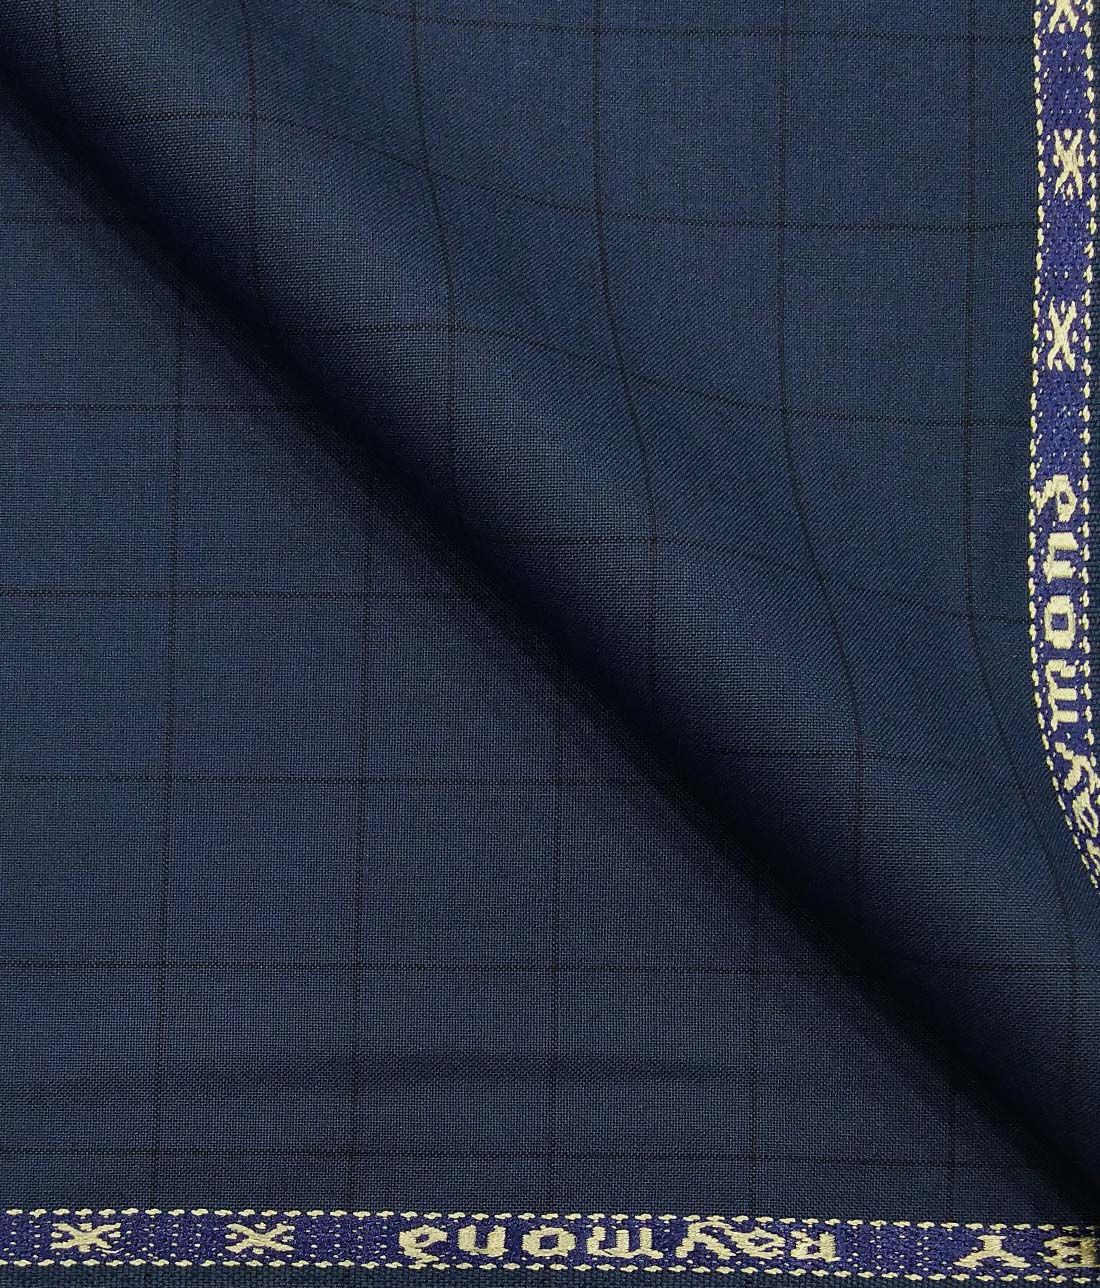 aa3a70368 Combo of Raymond Aegean Blue Checks Trouser Fabric With Nemesis Sky Blue  100% Giza Cotton